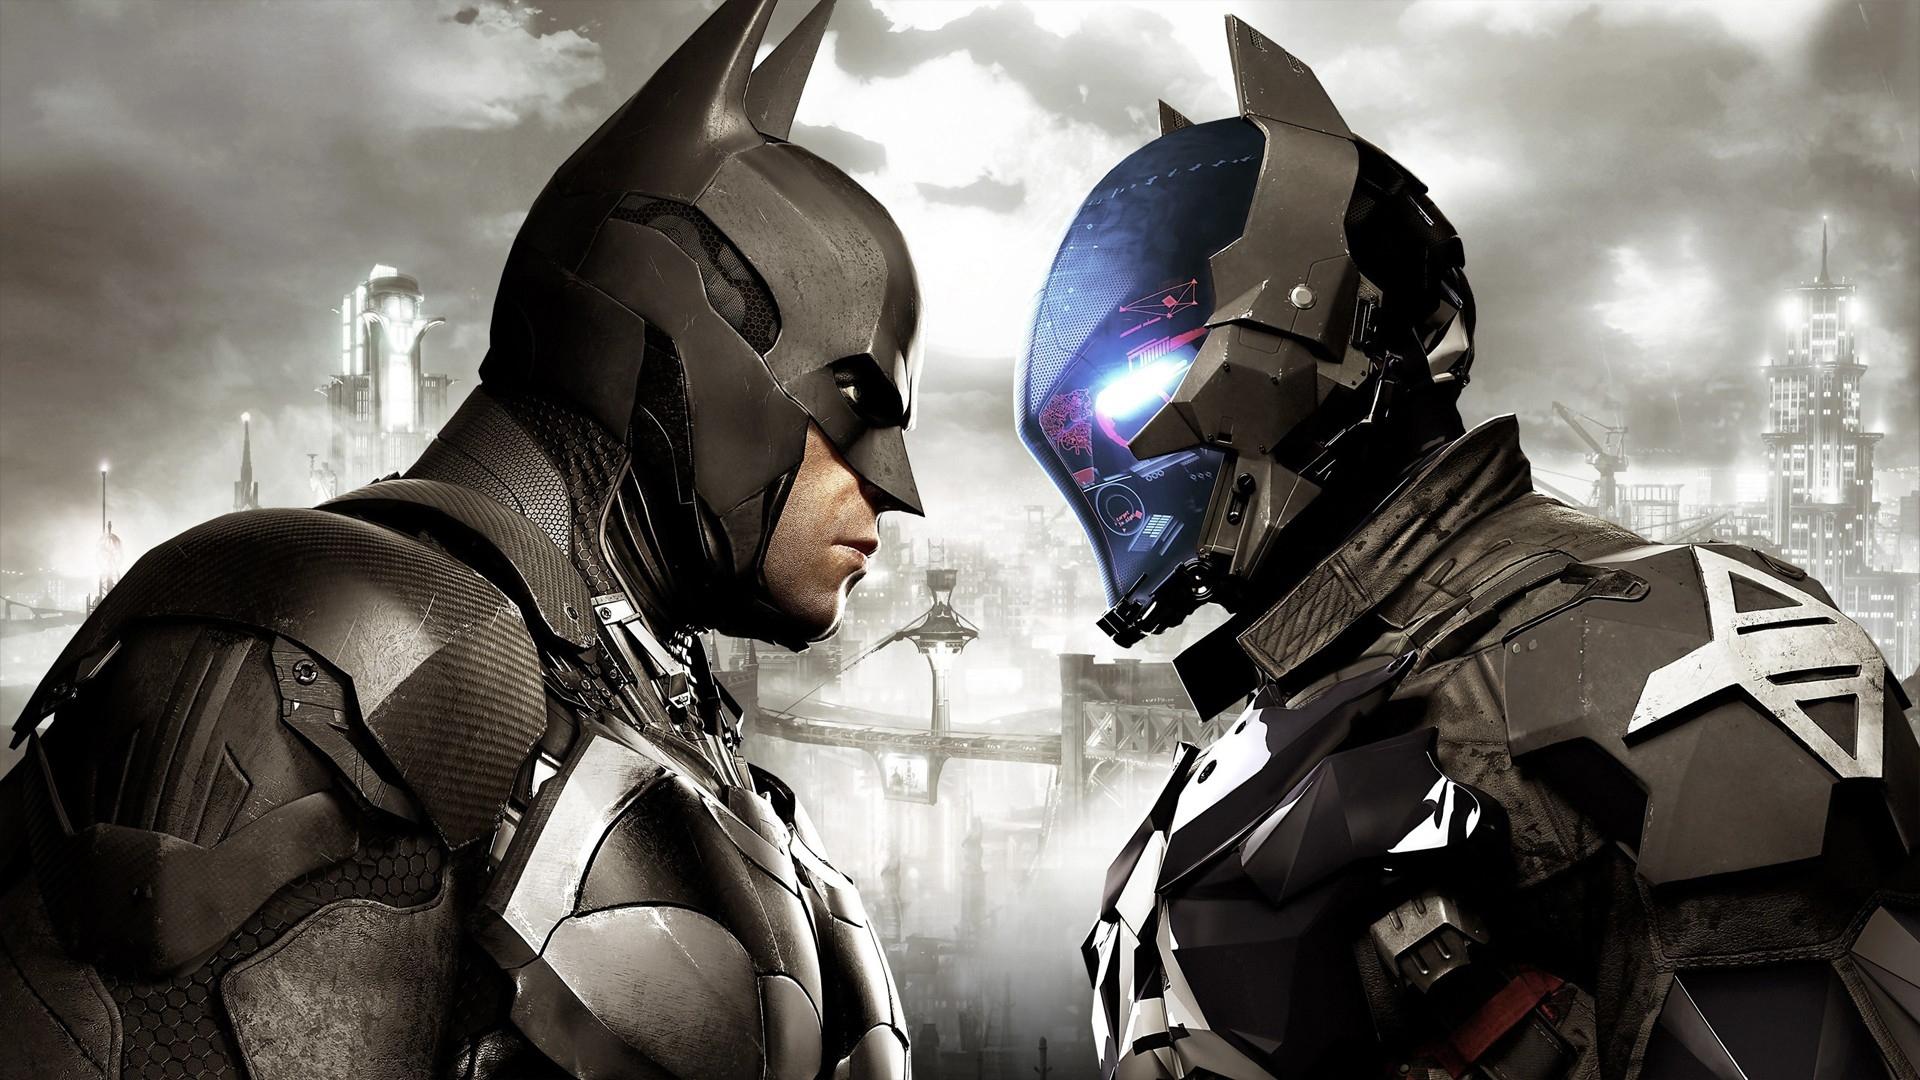 505 Games и экс-авторы Batman: Arkham Knight, Deus Ex и Far Cry 4 выпустят новую игру на Unreal Engine